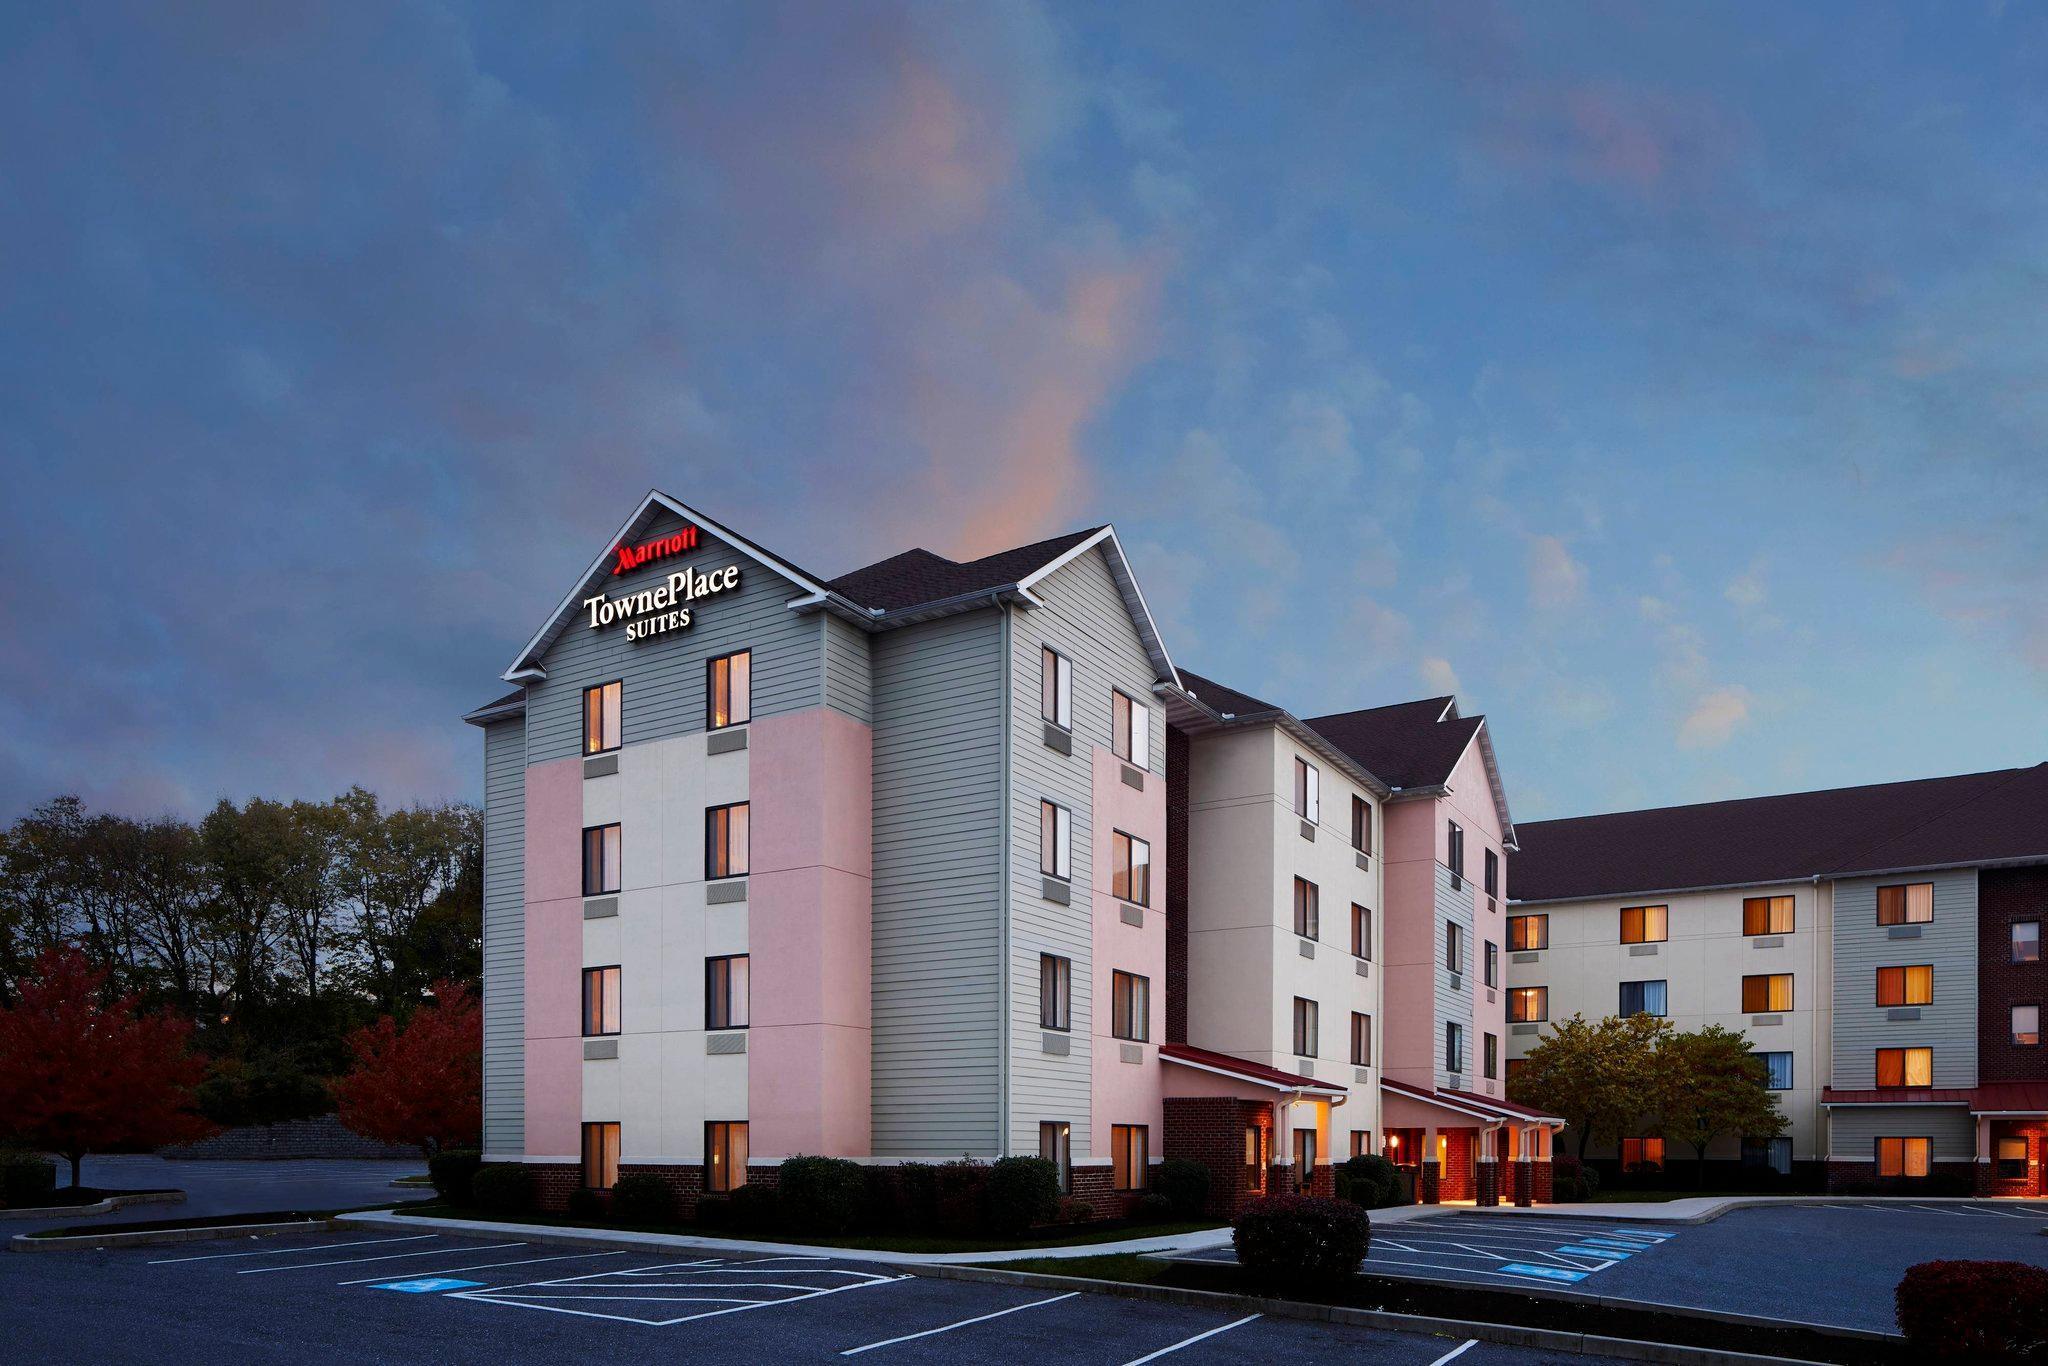 TownePlace Suites Harrisburg Hershey